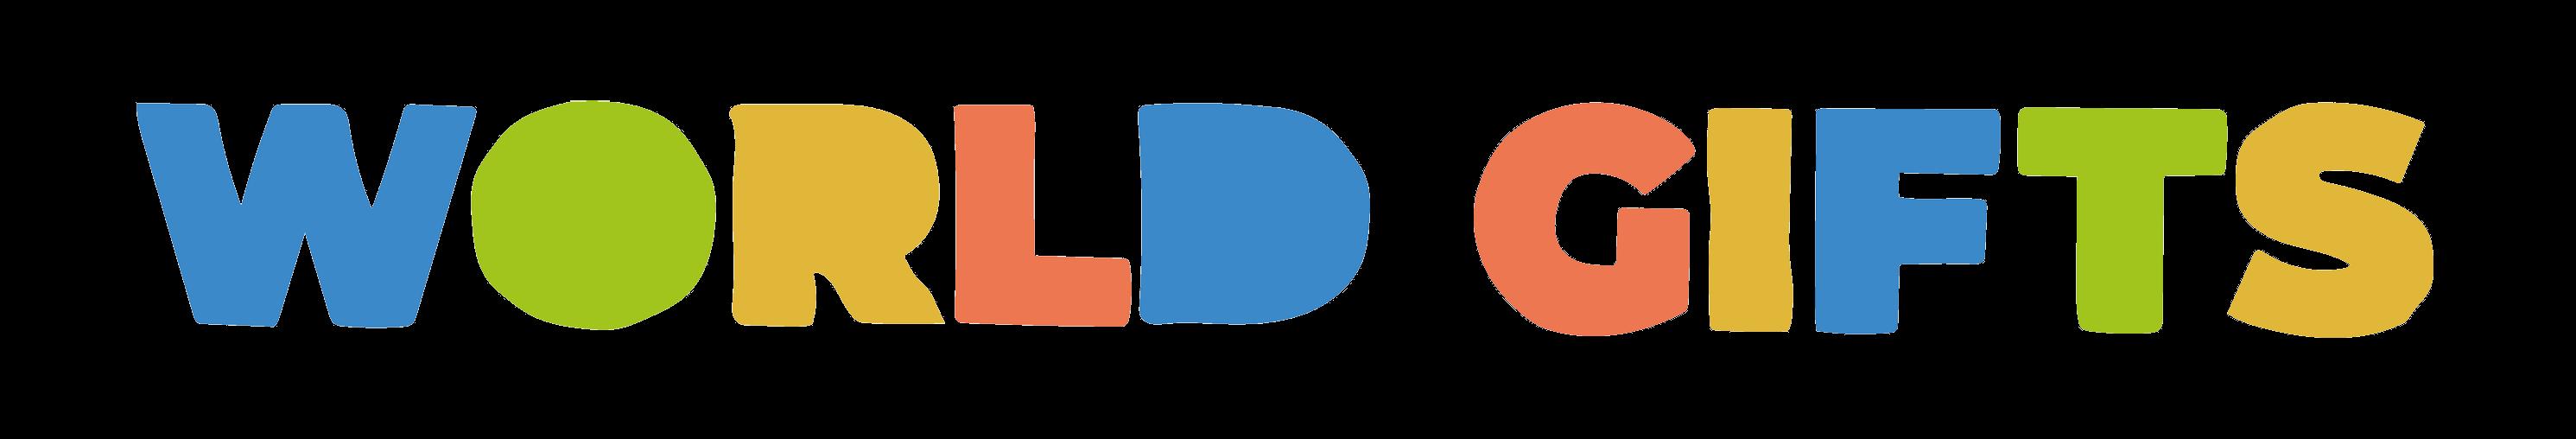 World Gifts Logo